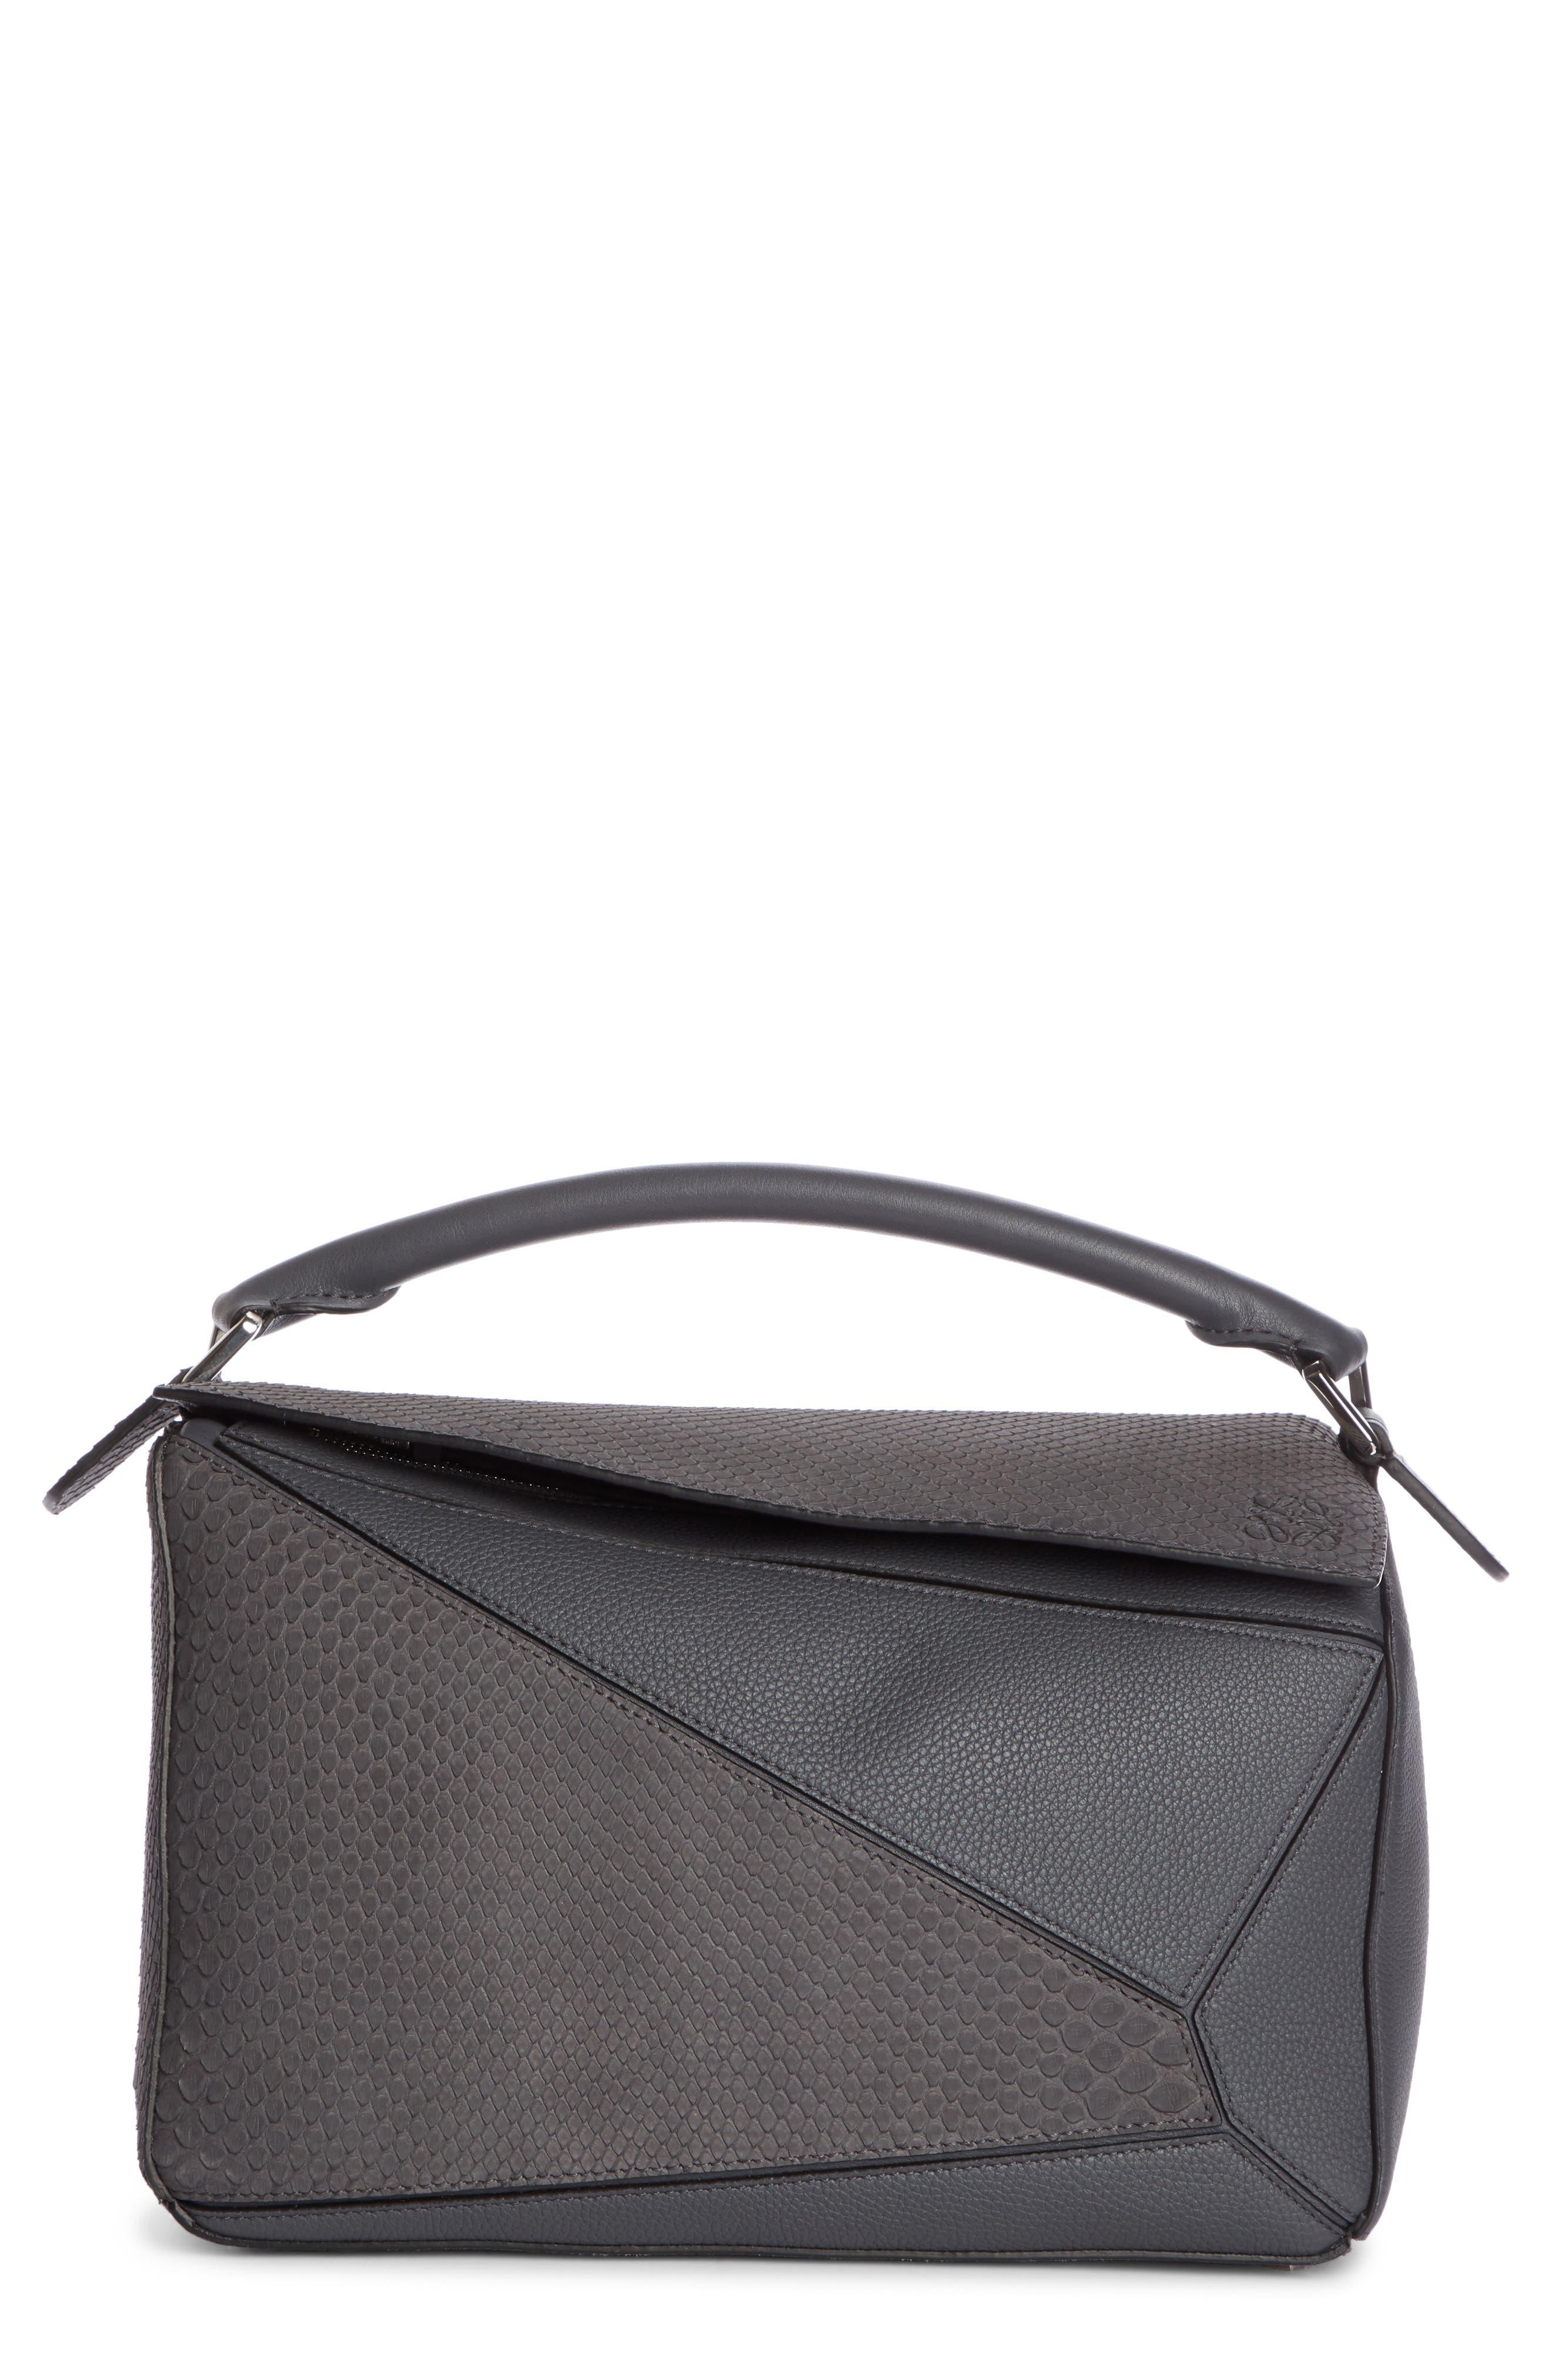 Medium Puzzle Leather Shoulder Bag,                             Main thumbnail 1, color,                             ANTHRACITE